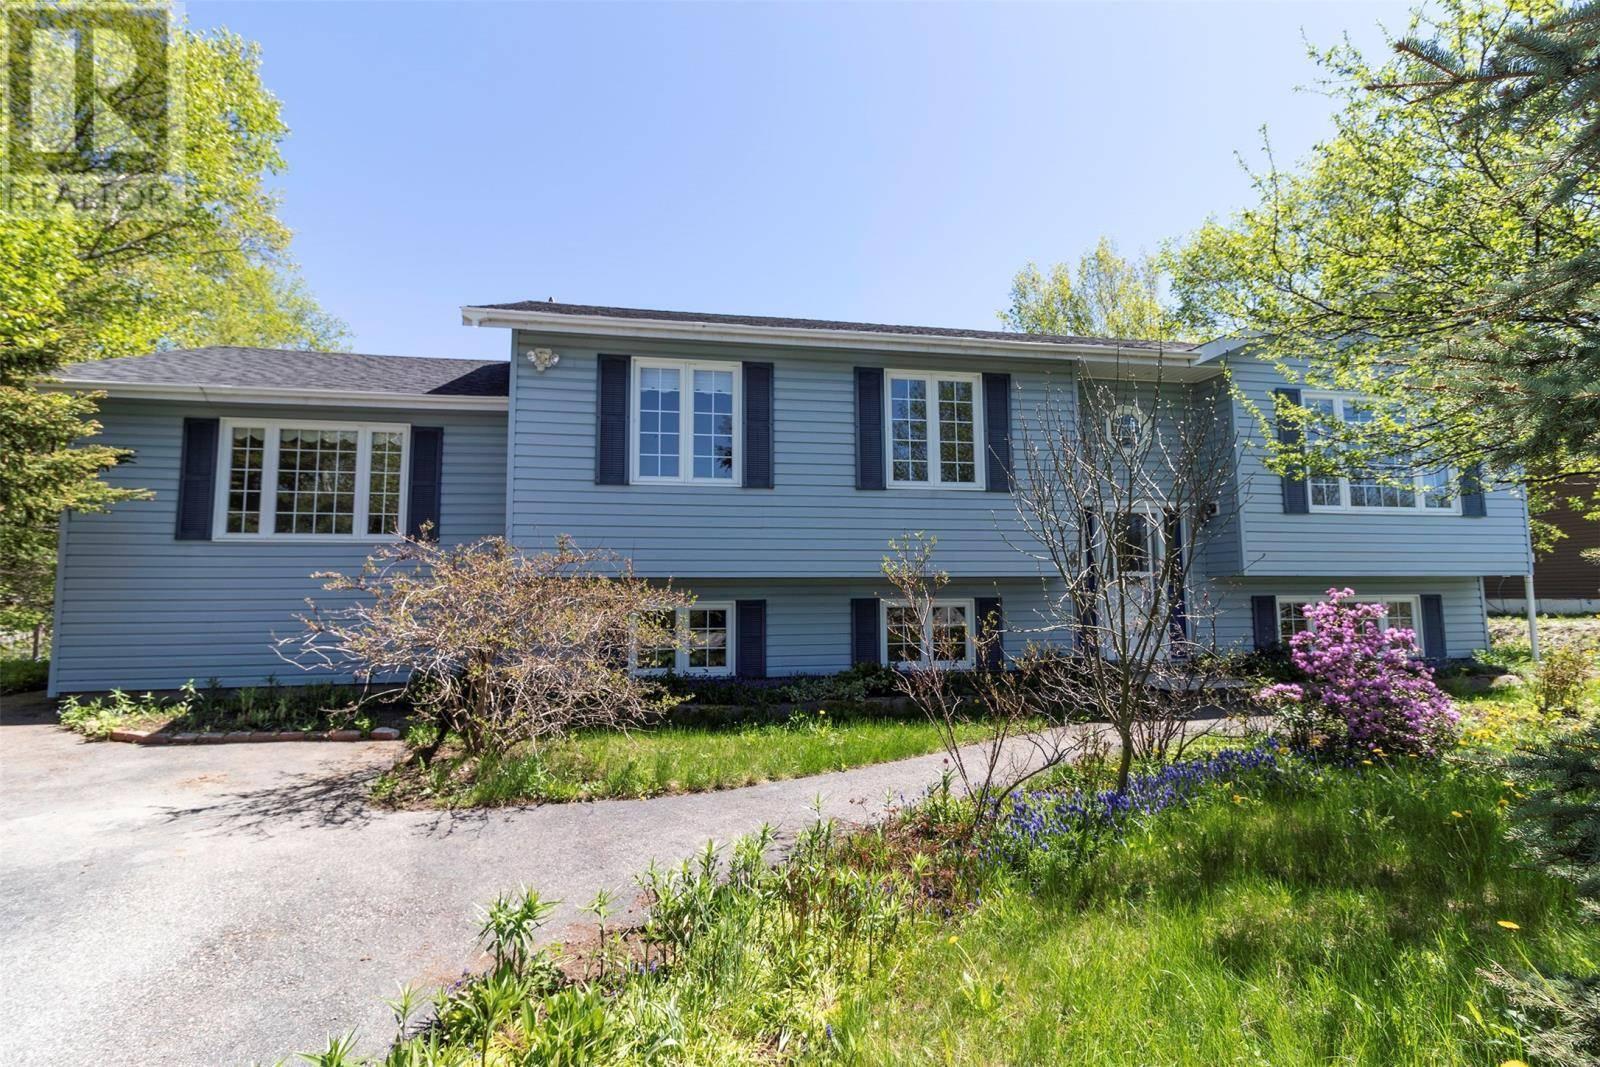 House for sale at 8 Earle Dr Pasadena Newfoundland - MLS: 1195564